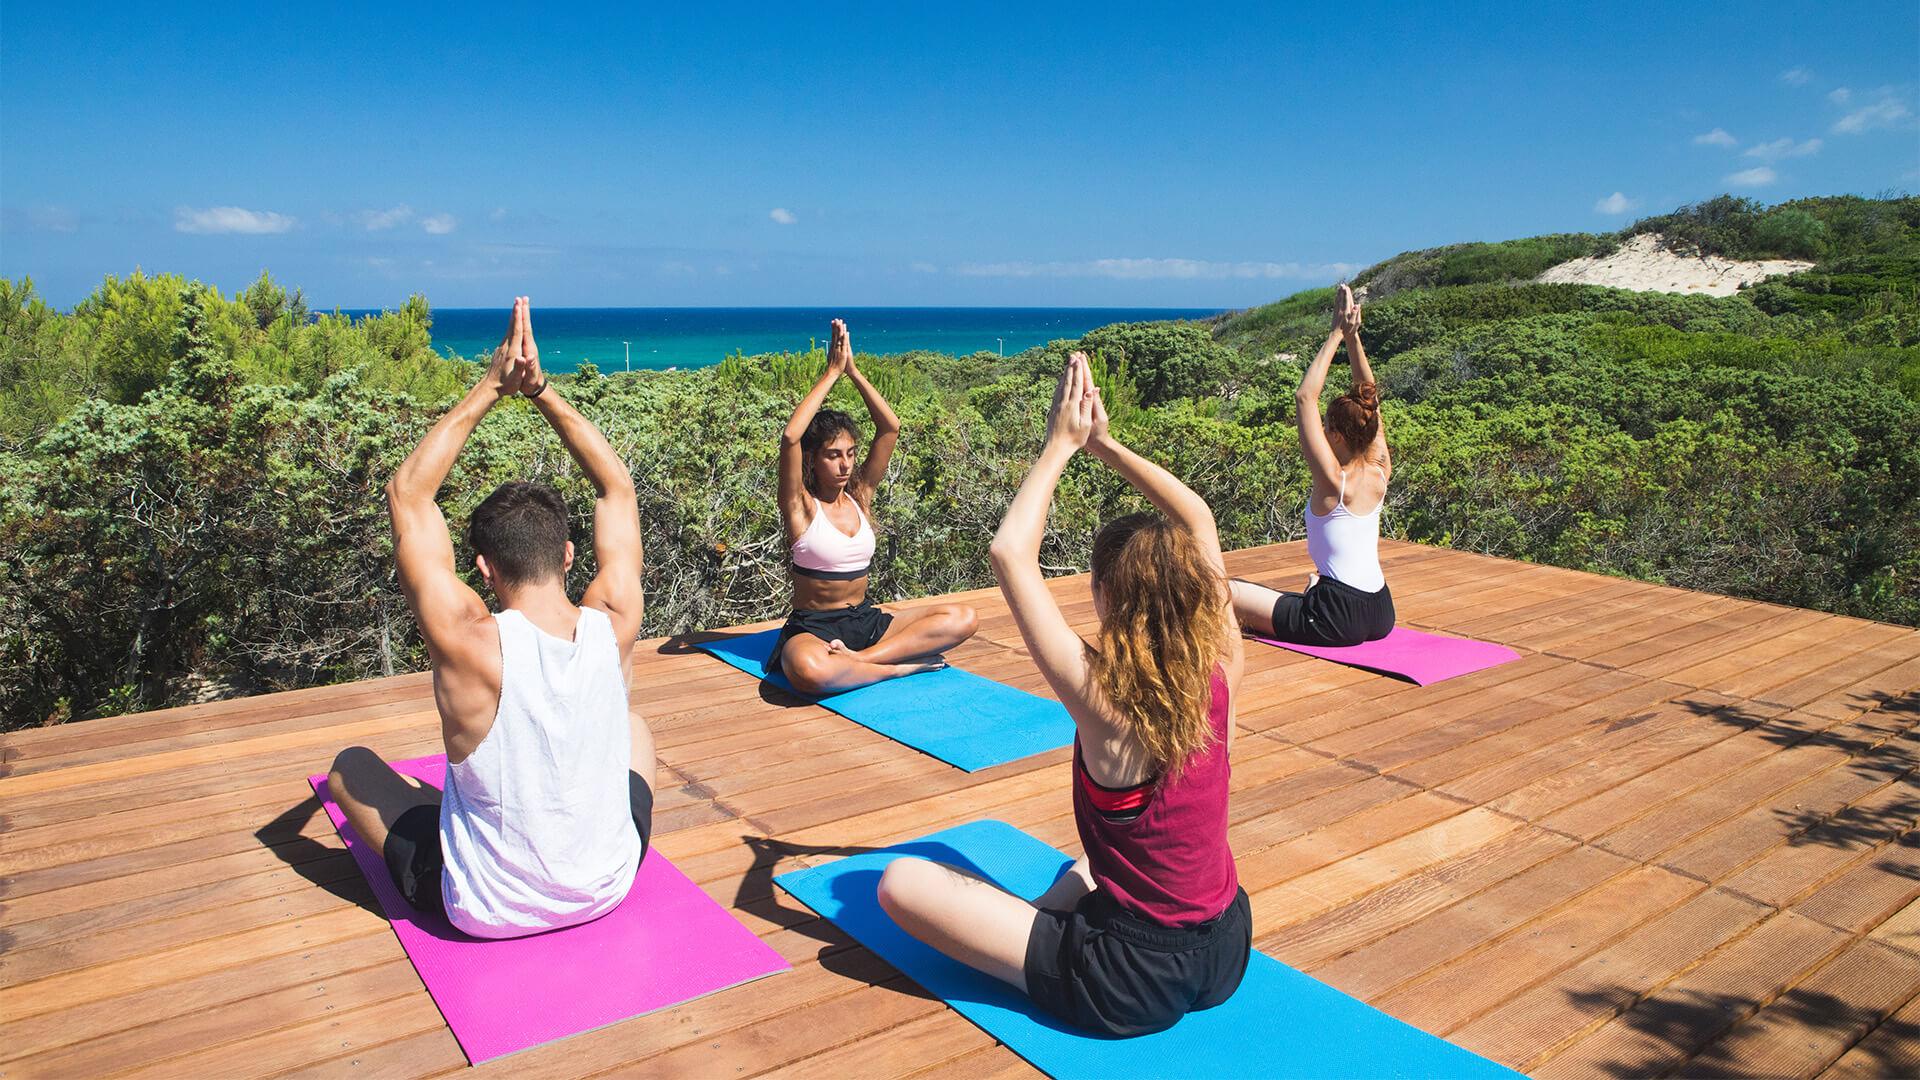 Le pedane yoga tra i ginepri secolari del Resort & SPA Le Dune, Badesi